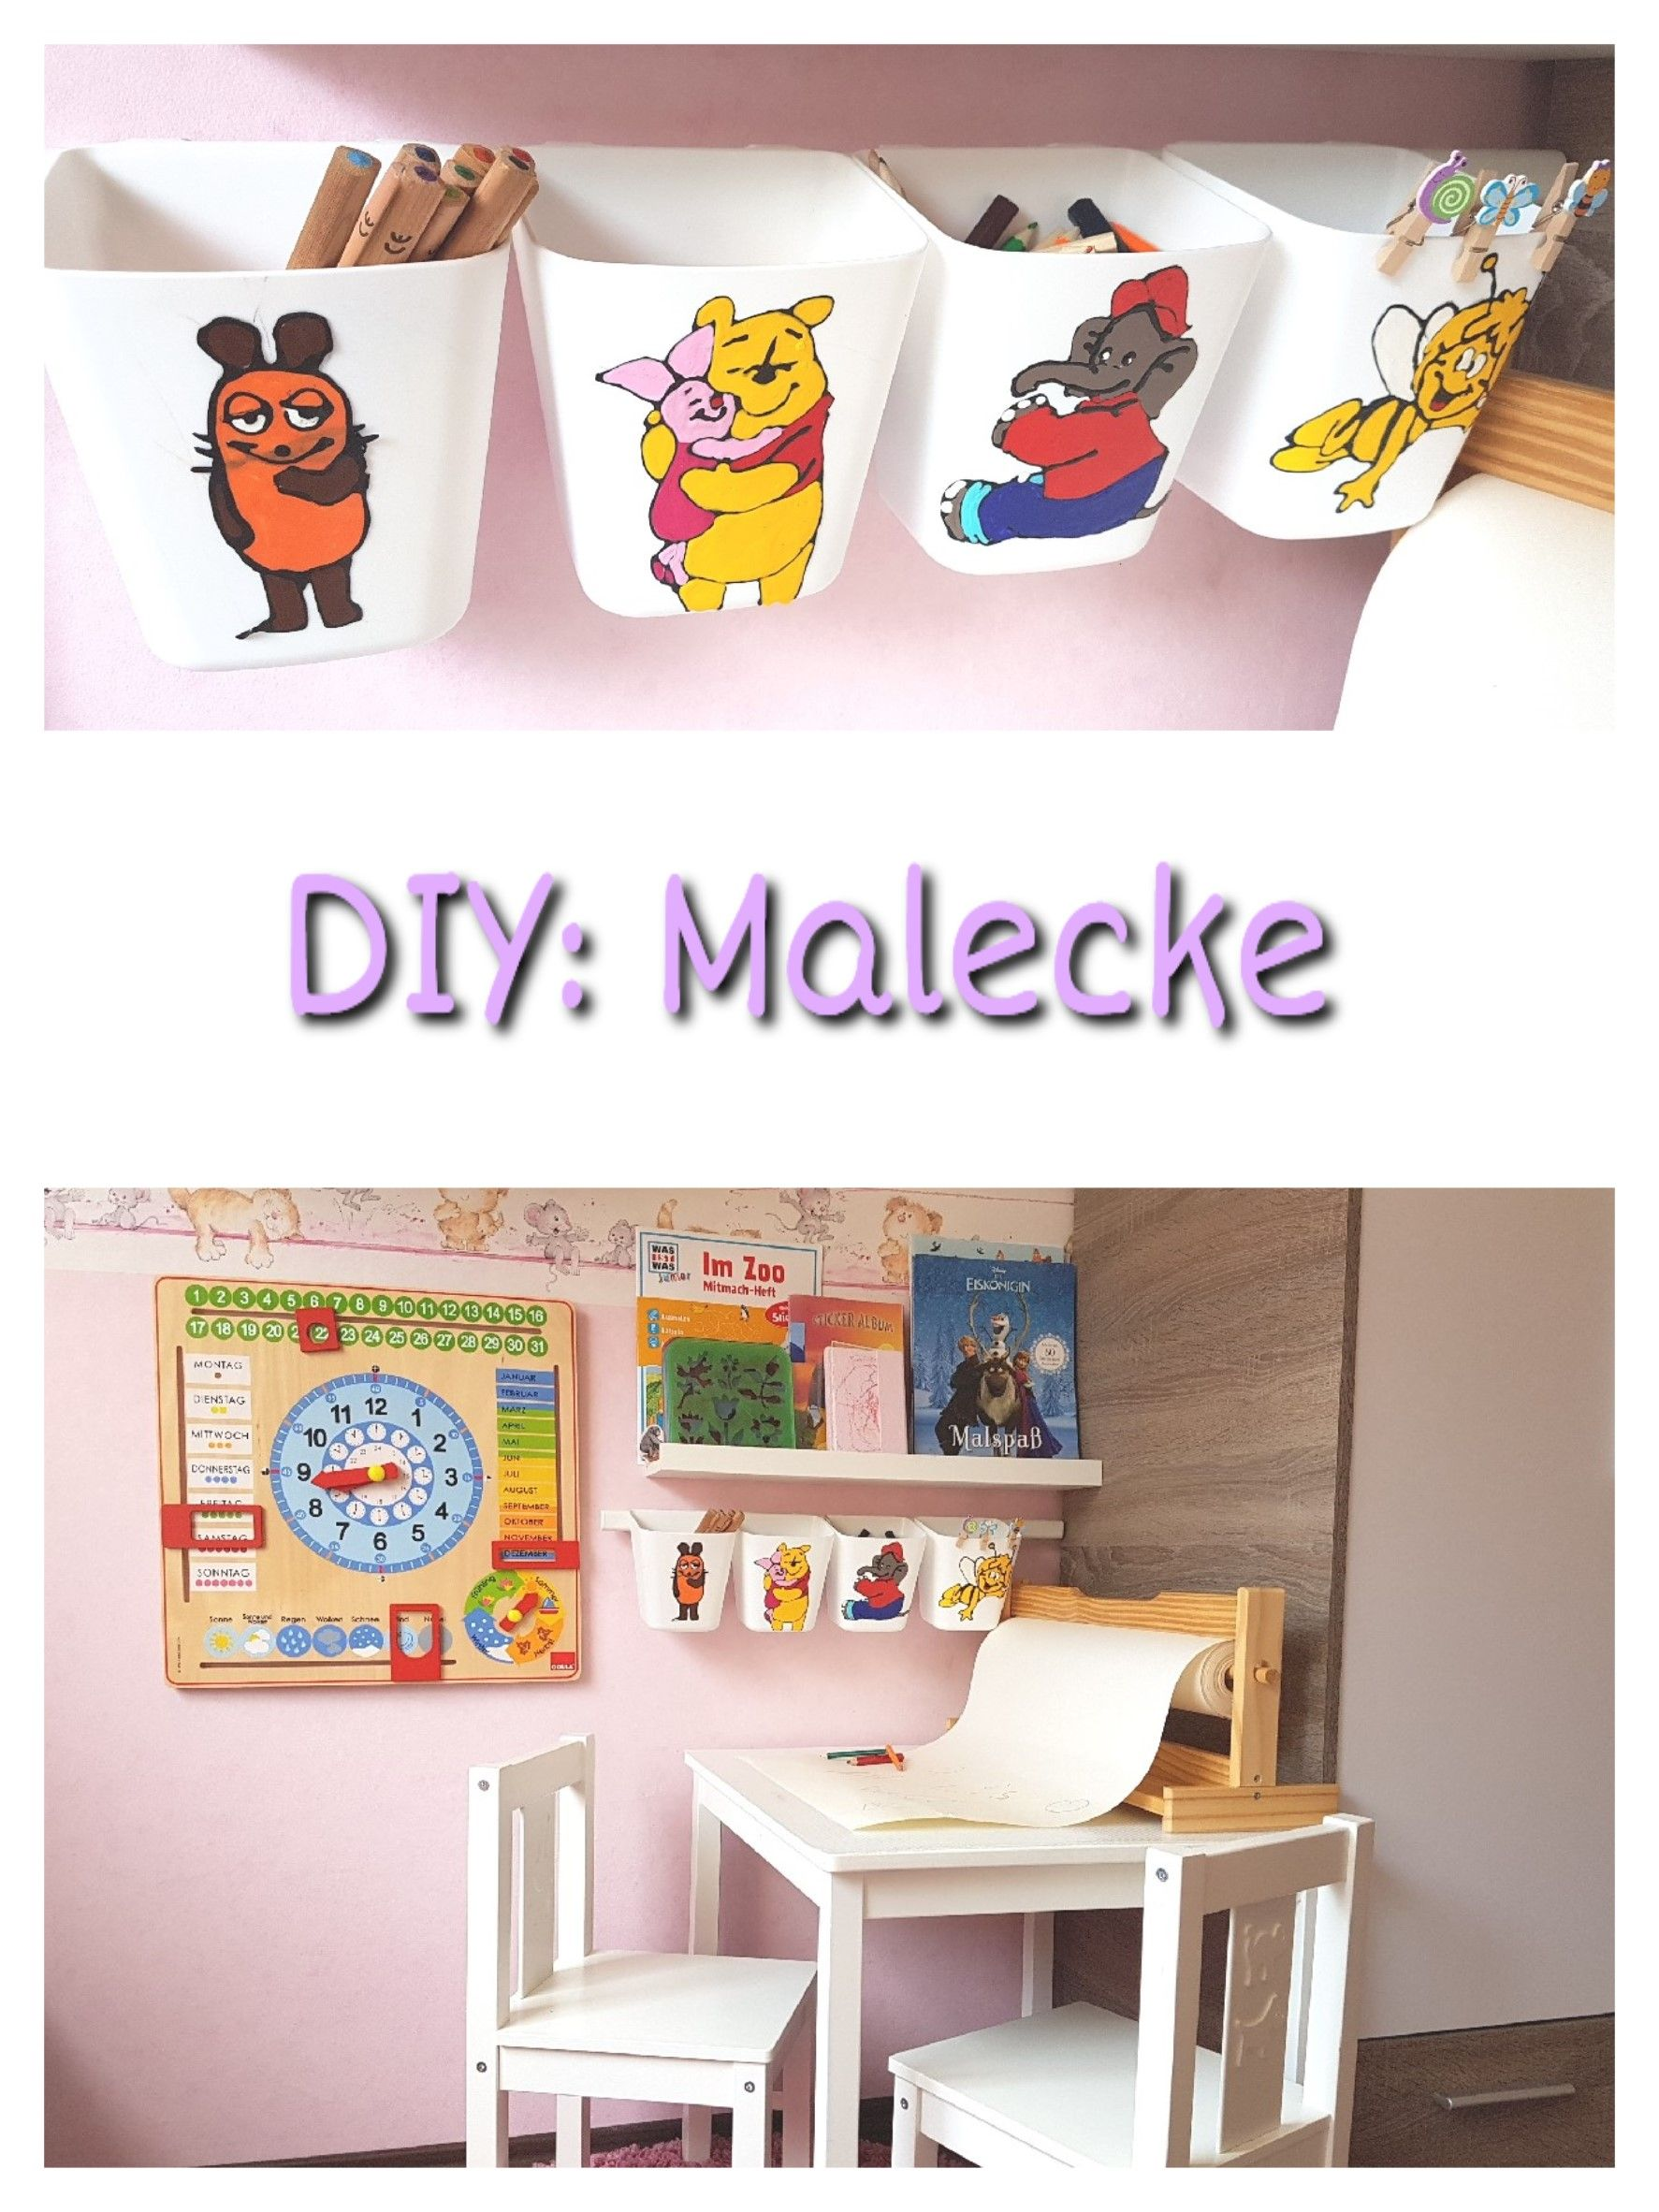 DIY, selber machen, Malecke, Kinderzimmer, Familie, Ikea, kreativ ...